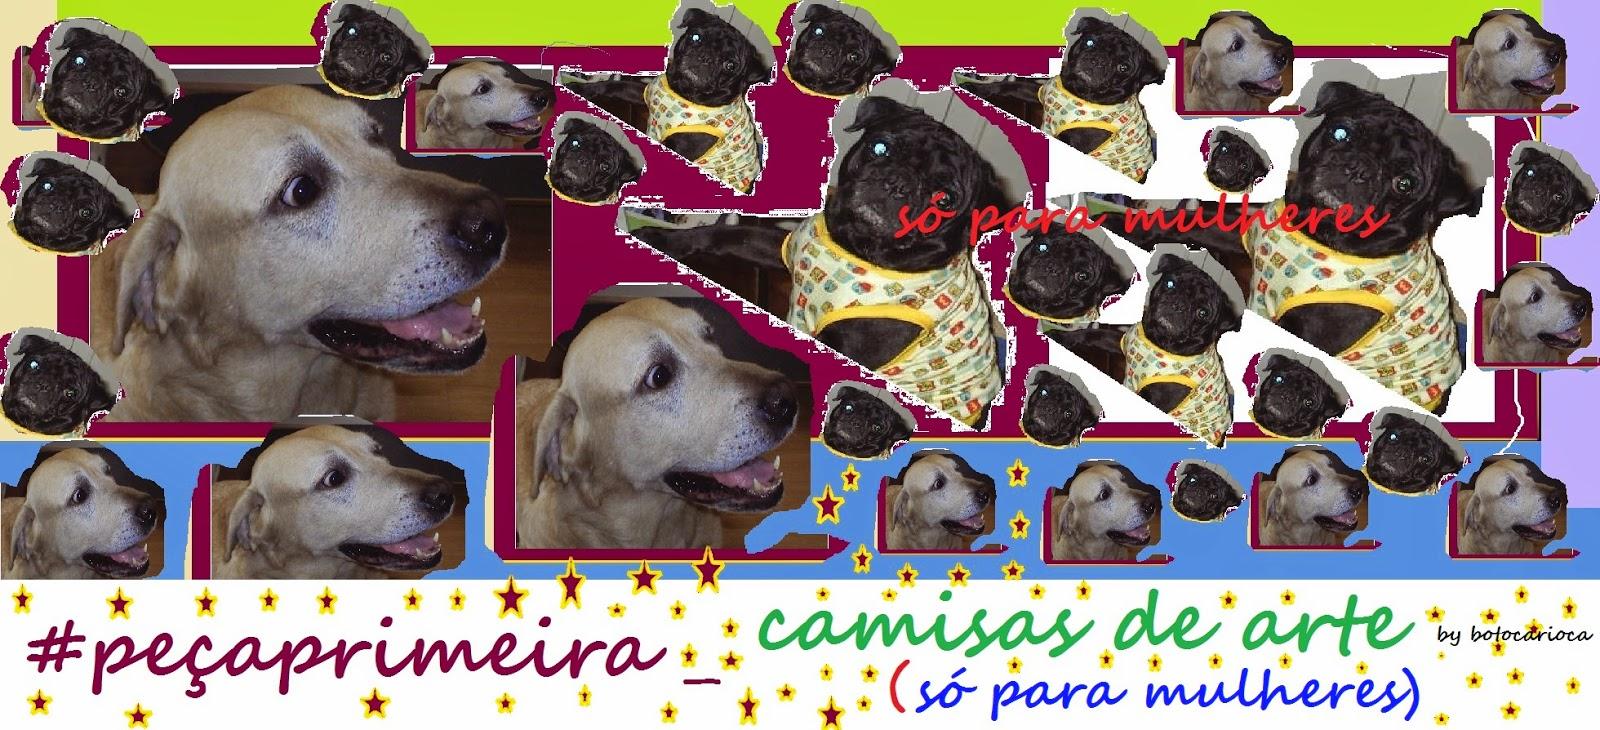 http://botocarioca.blogspot.com.br/search/label/pe%C3%A7aprimeira